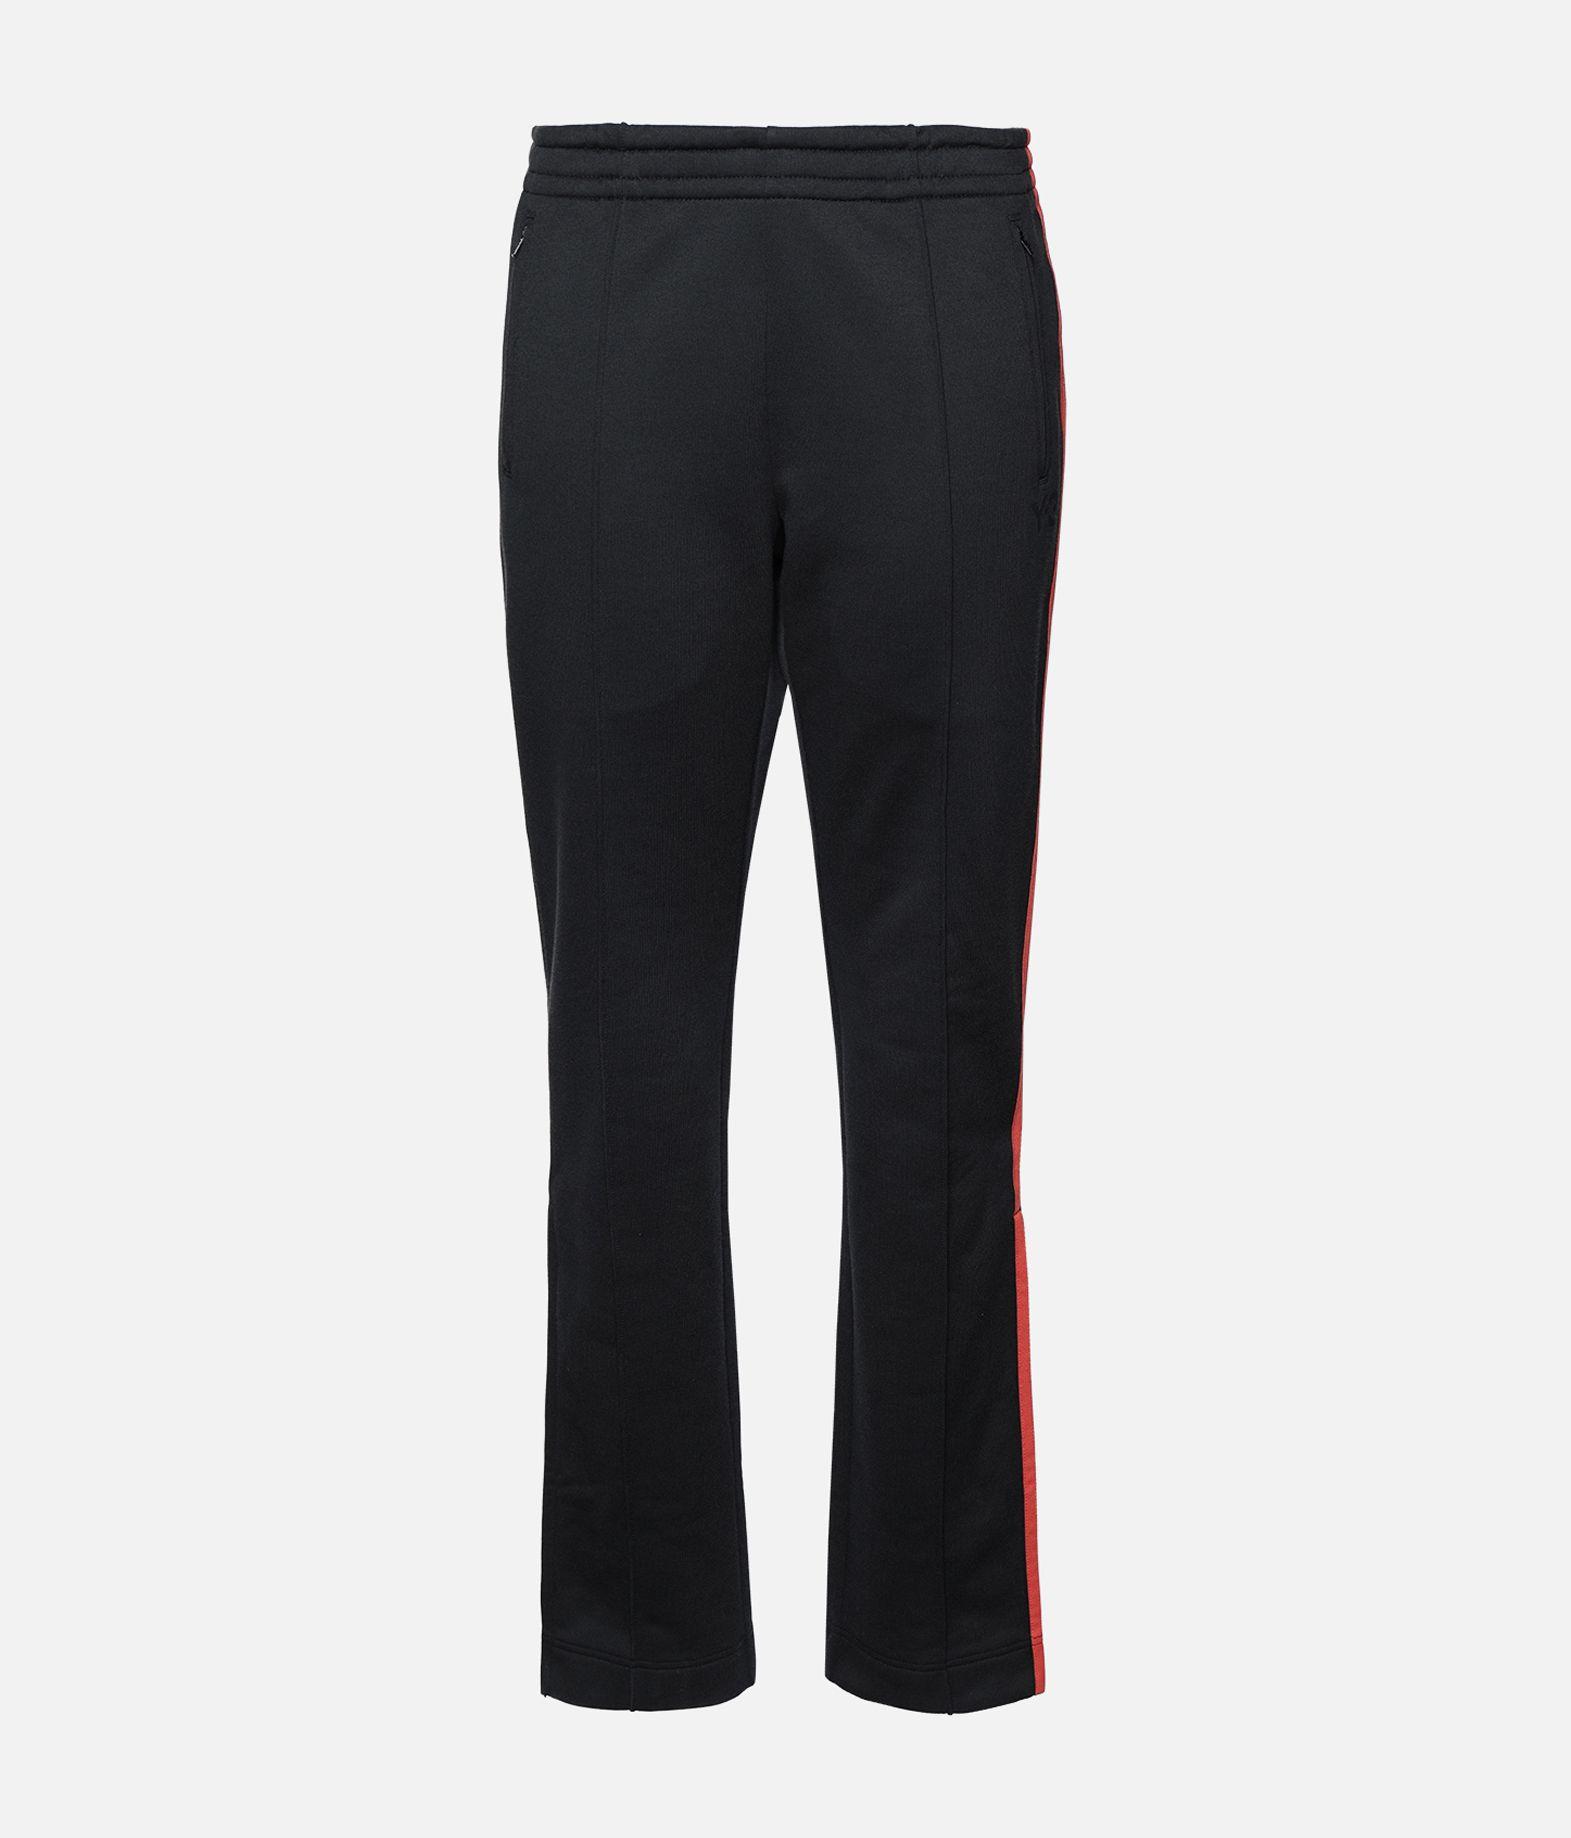 Y-3 Y-3 3-Stripes Slim Track Pants Track pant Woman f